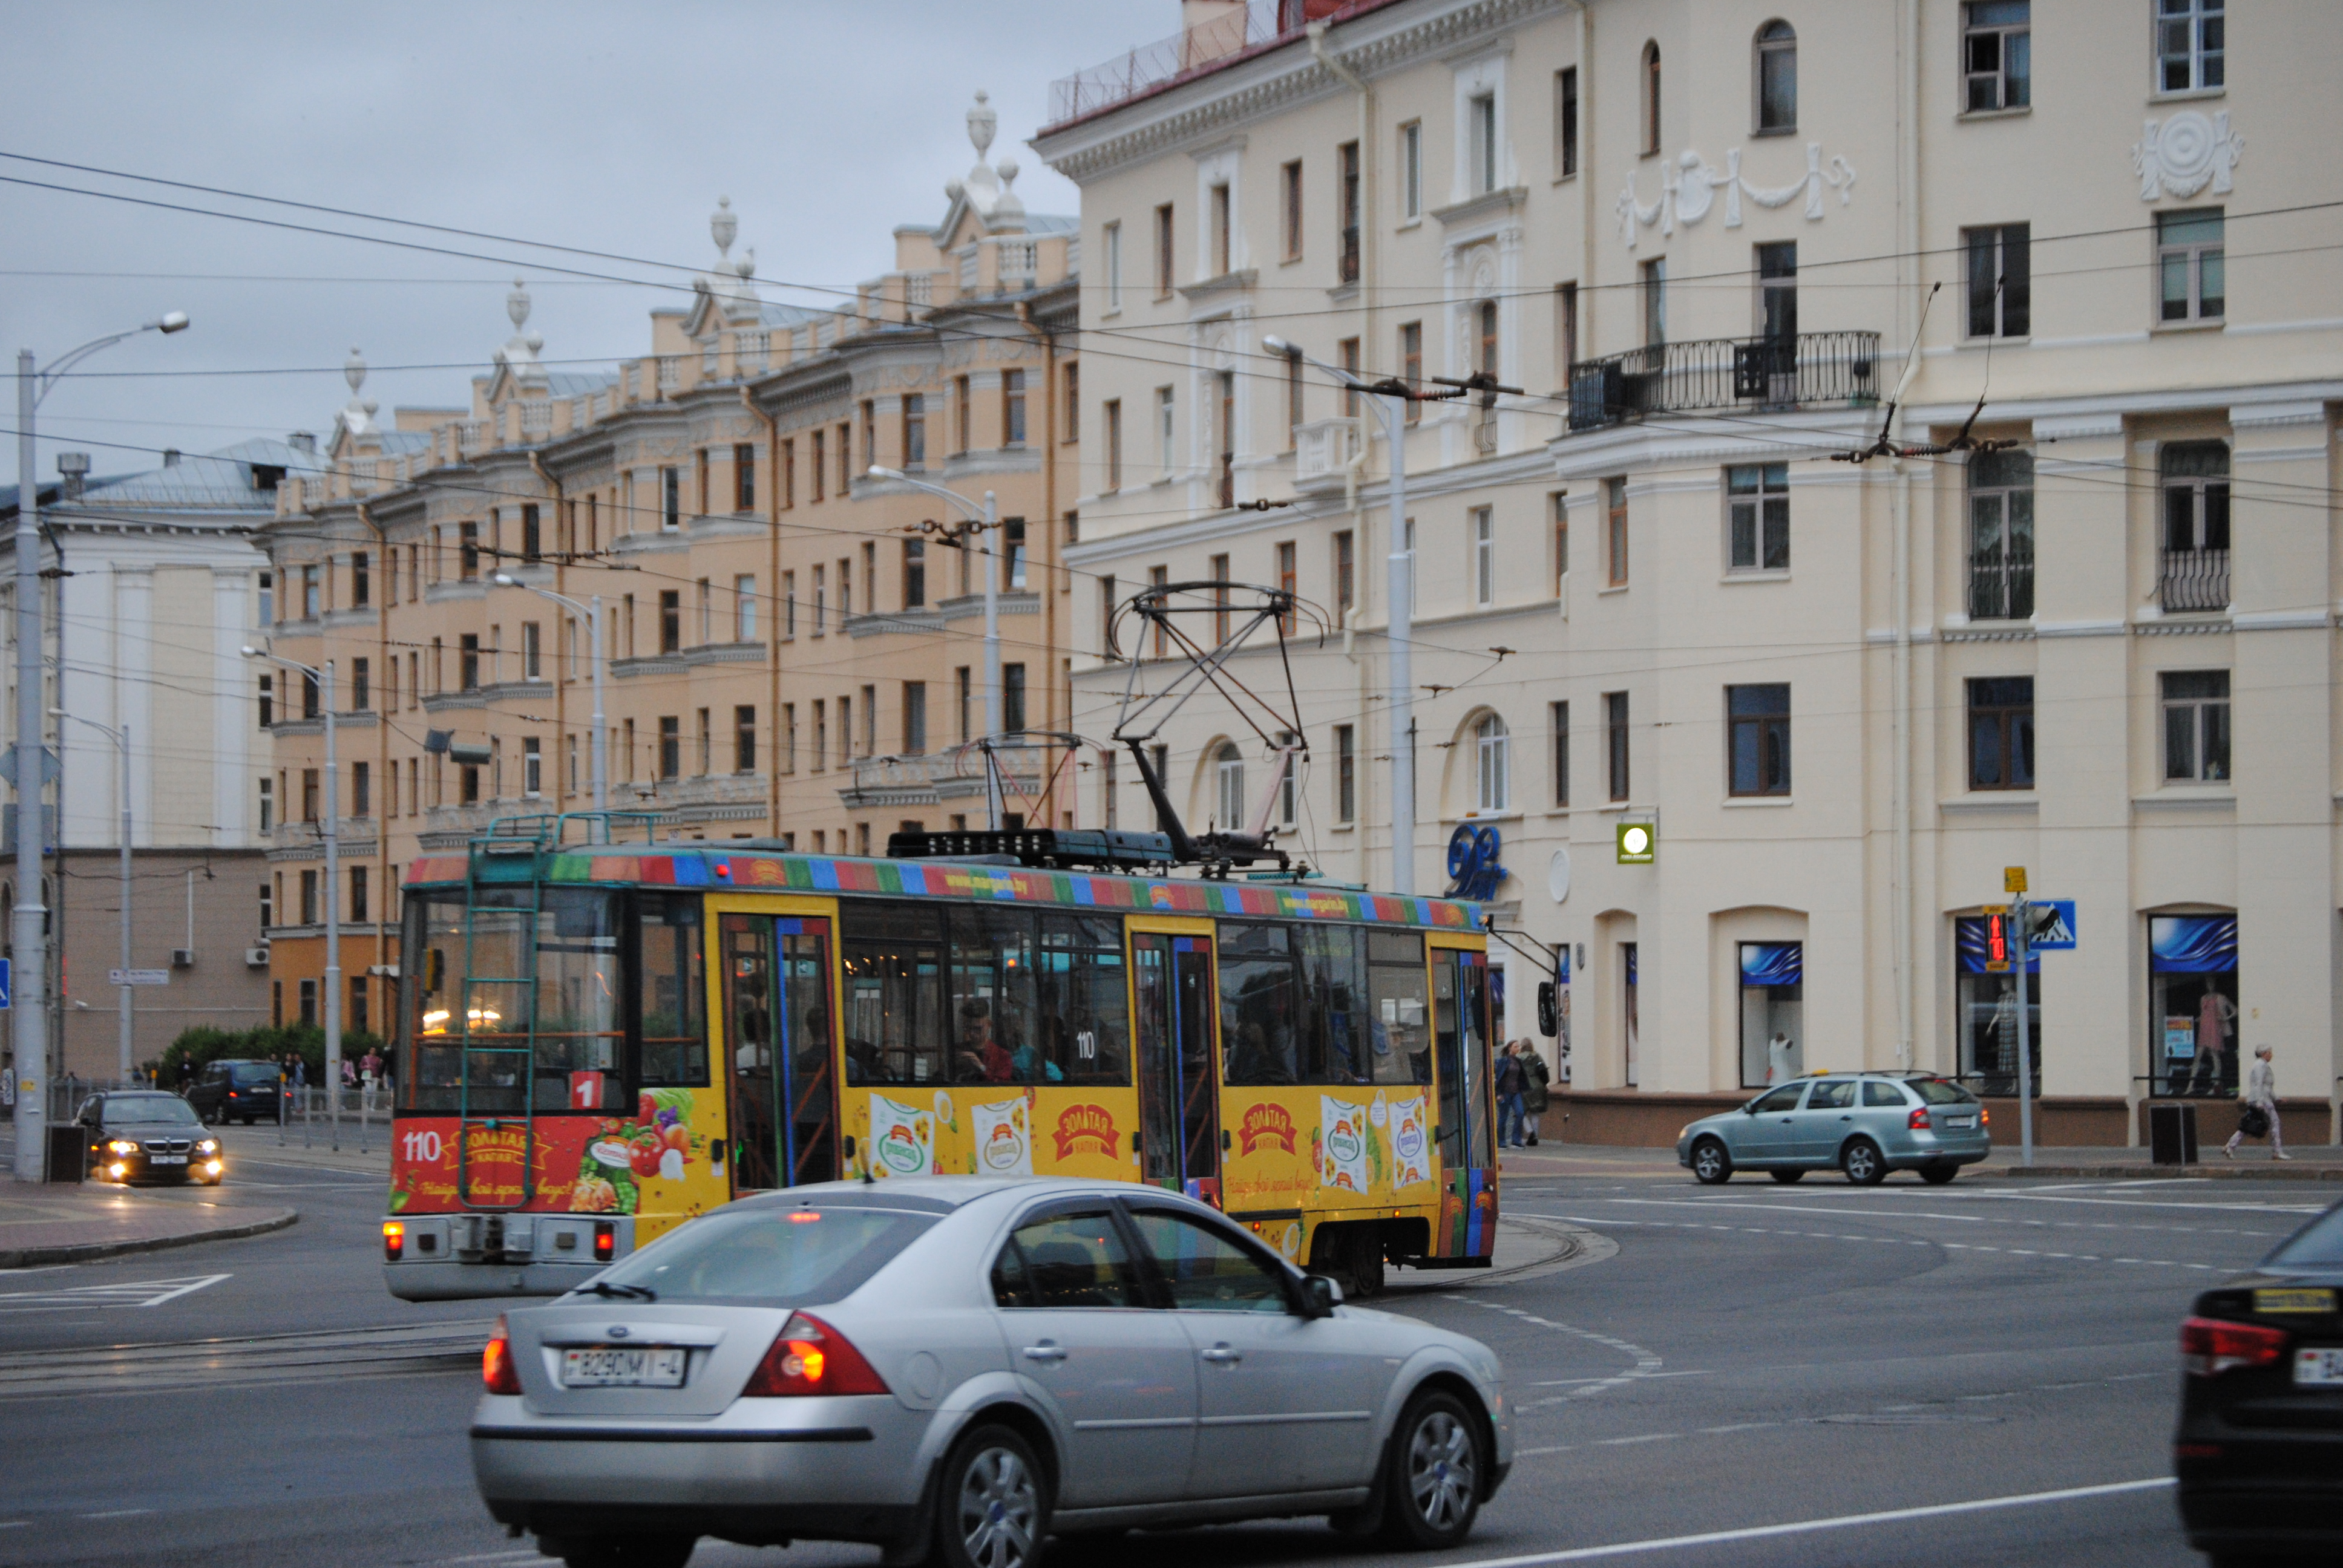 tranvía amarillo antiguo de Minsk